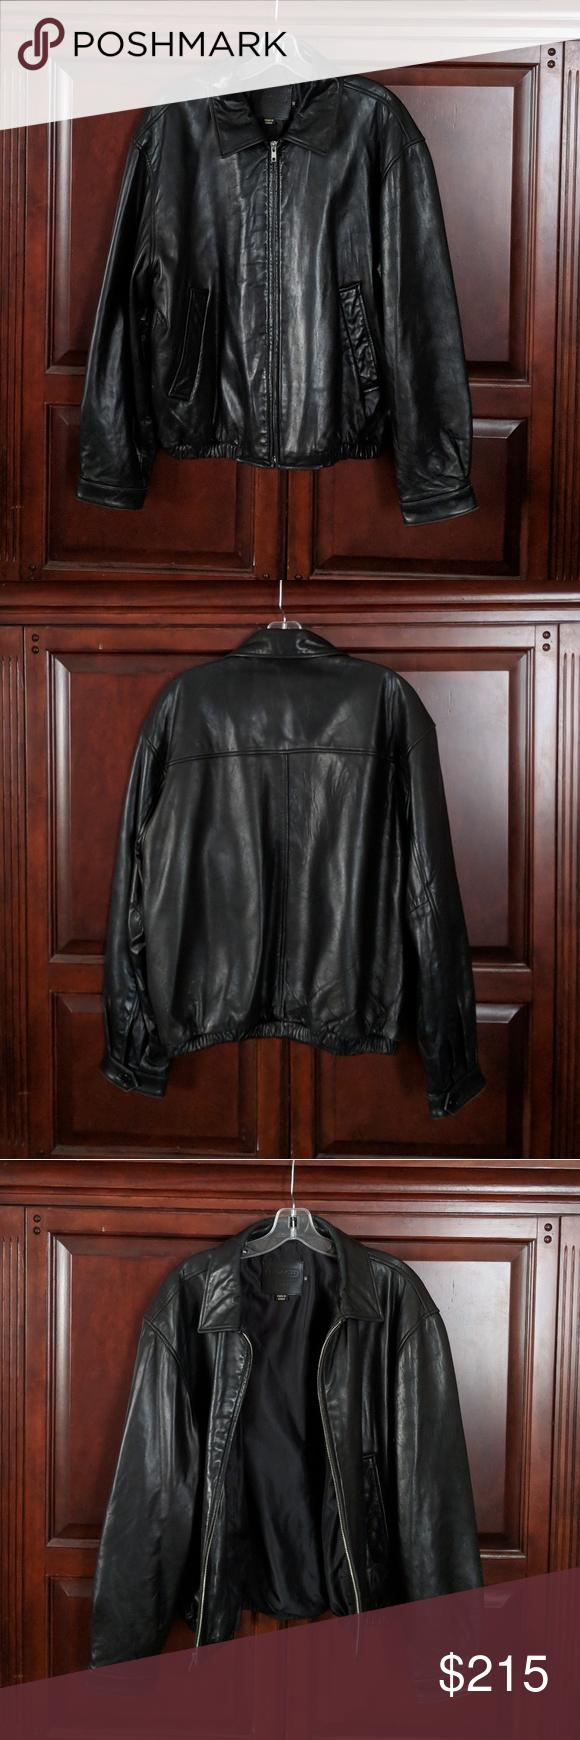 Coach black leather jacket size small Black leather